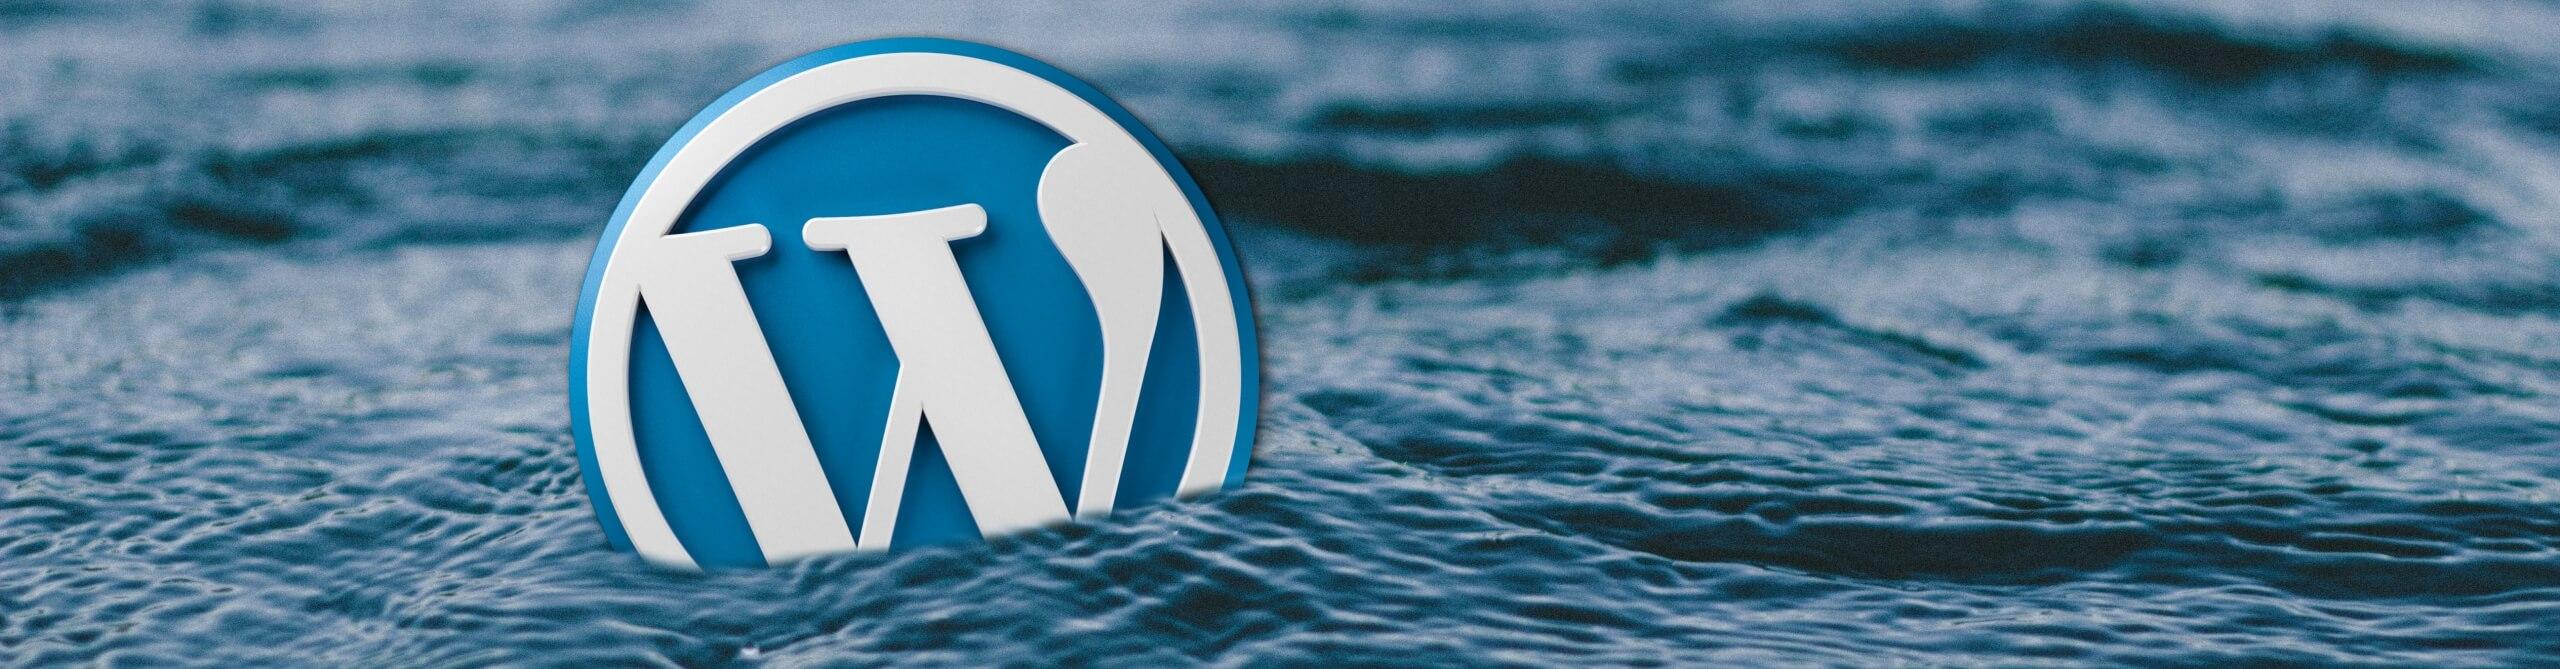 MikeGriffin.me WordPress Water Banner